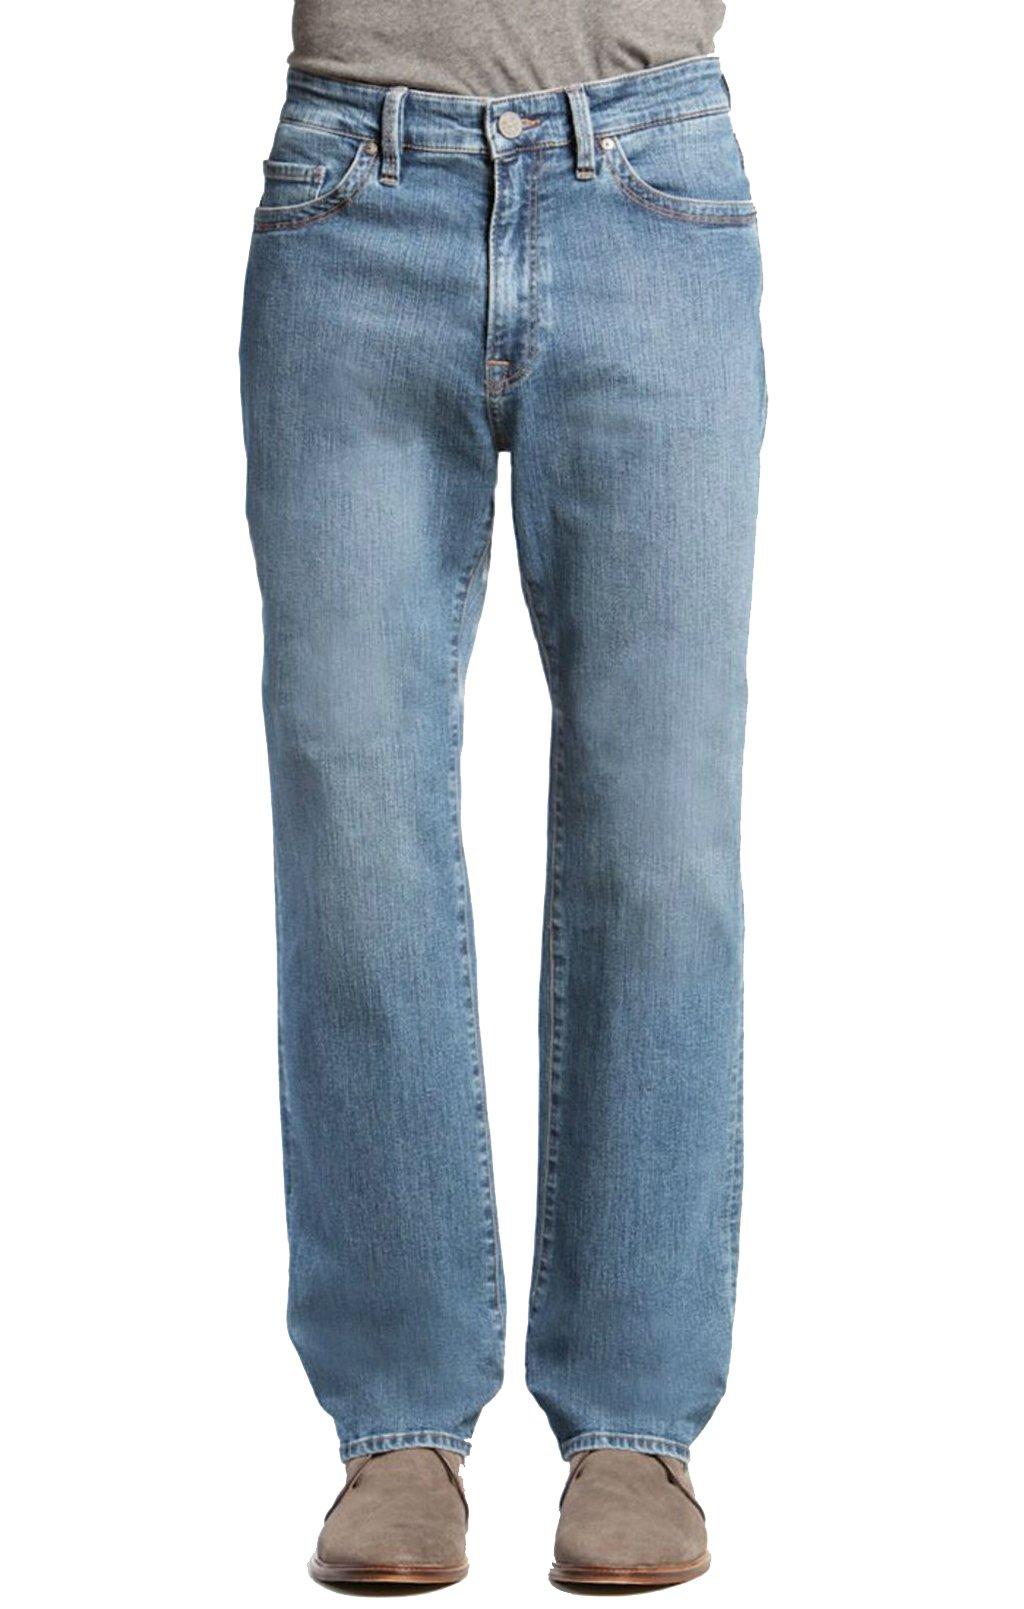 34 Heritage Classic Charisma Jean